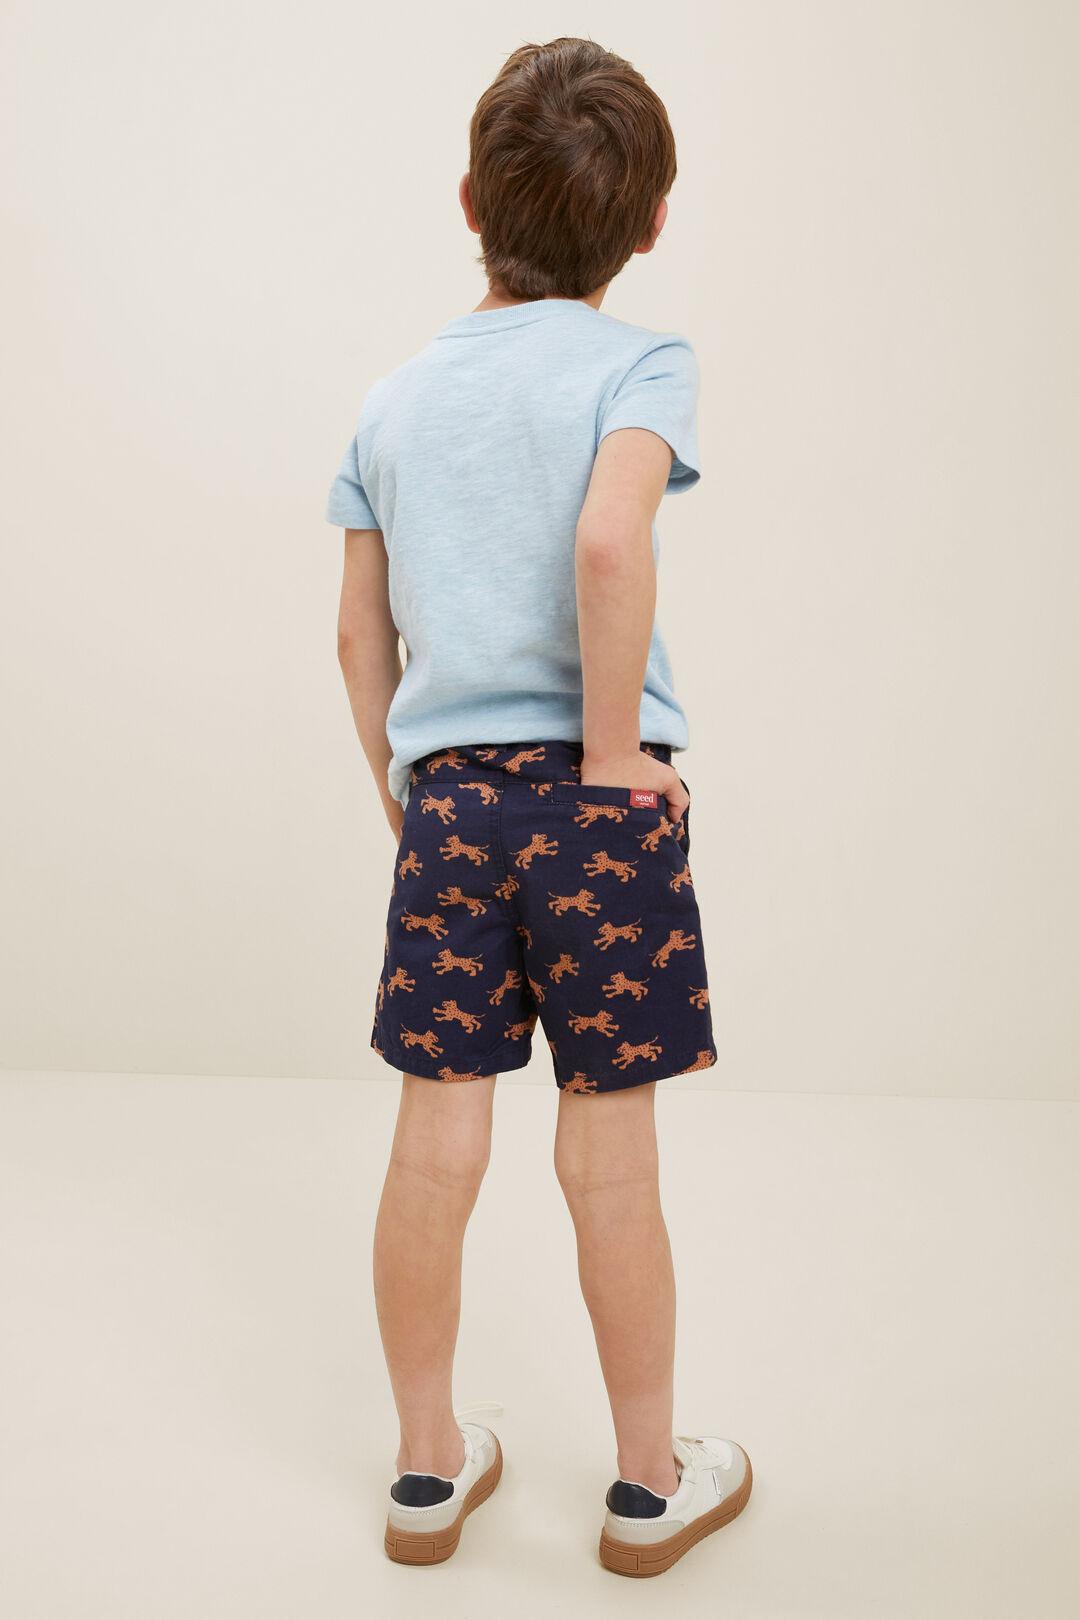 Tiger Chino Shorts  Midnight Blue  hi-res